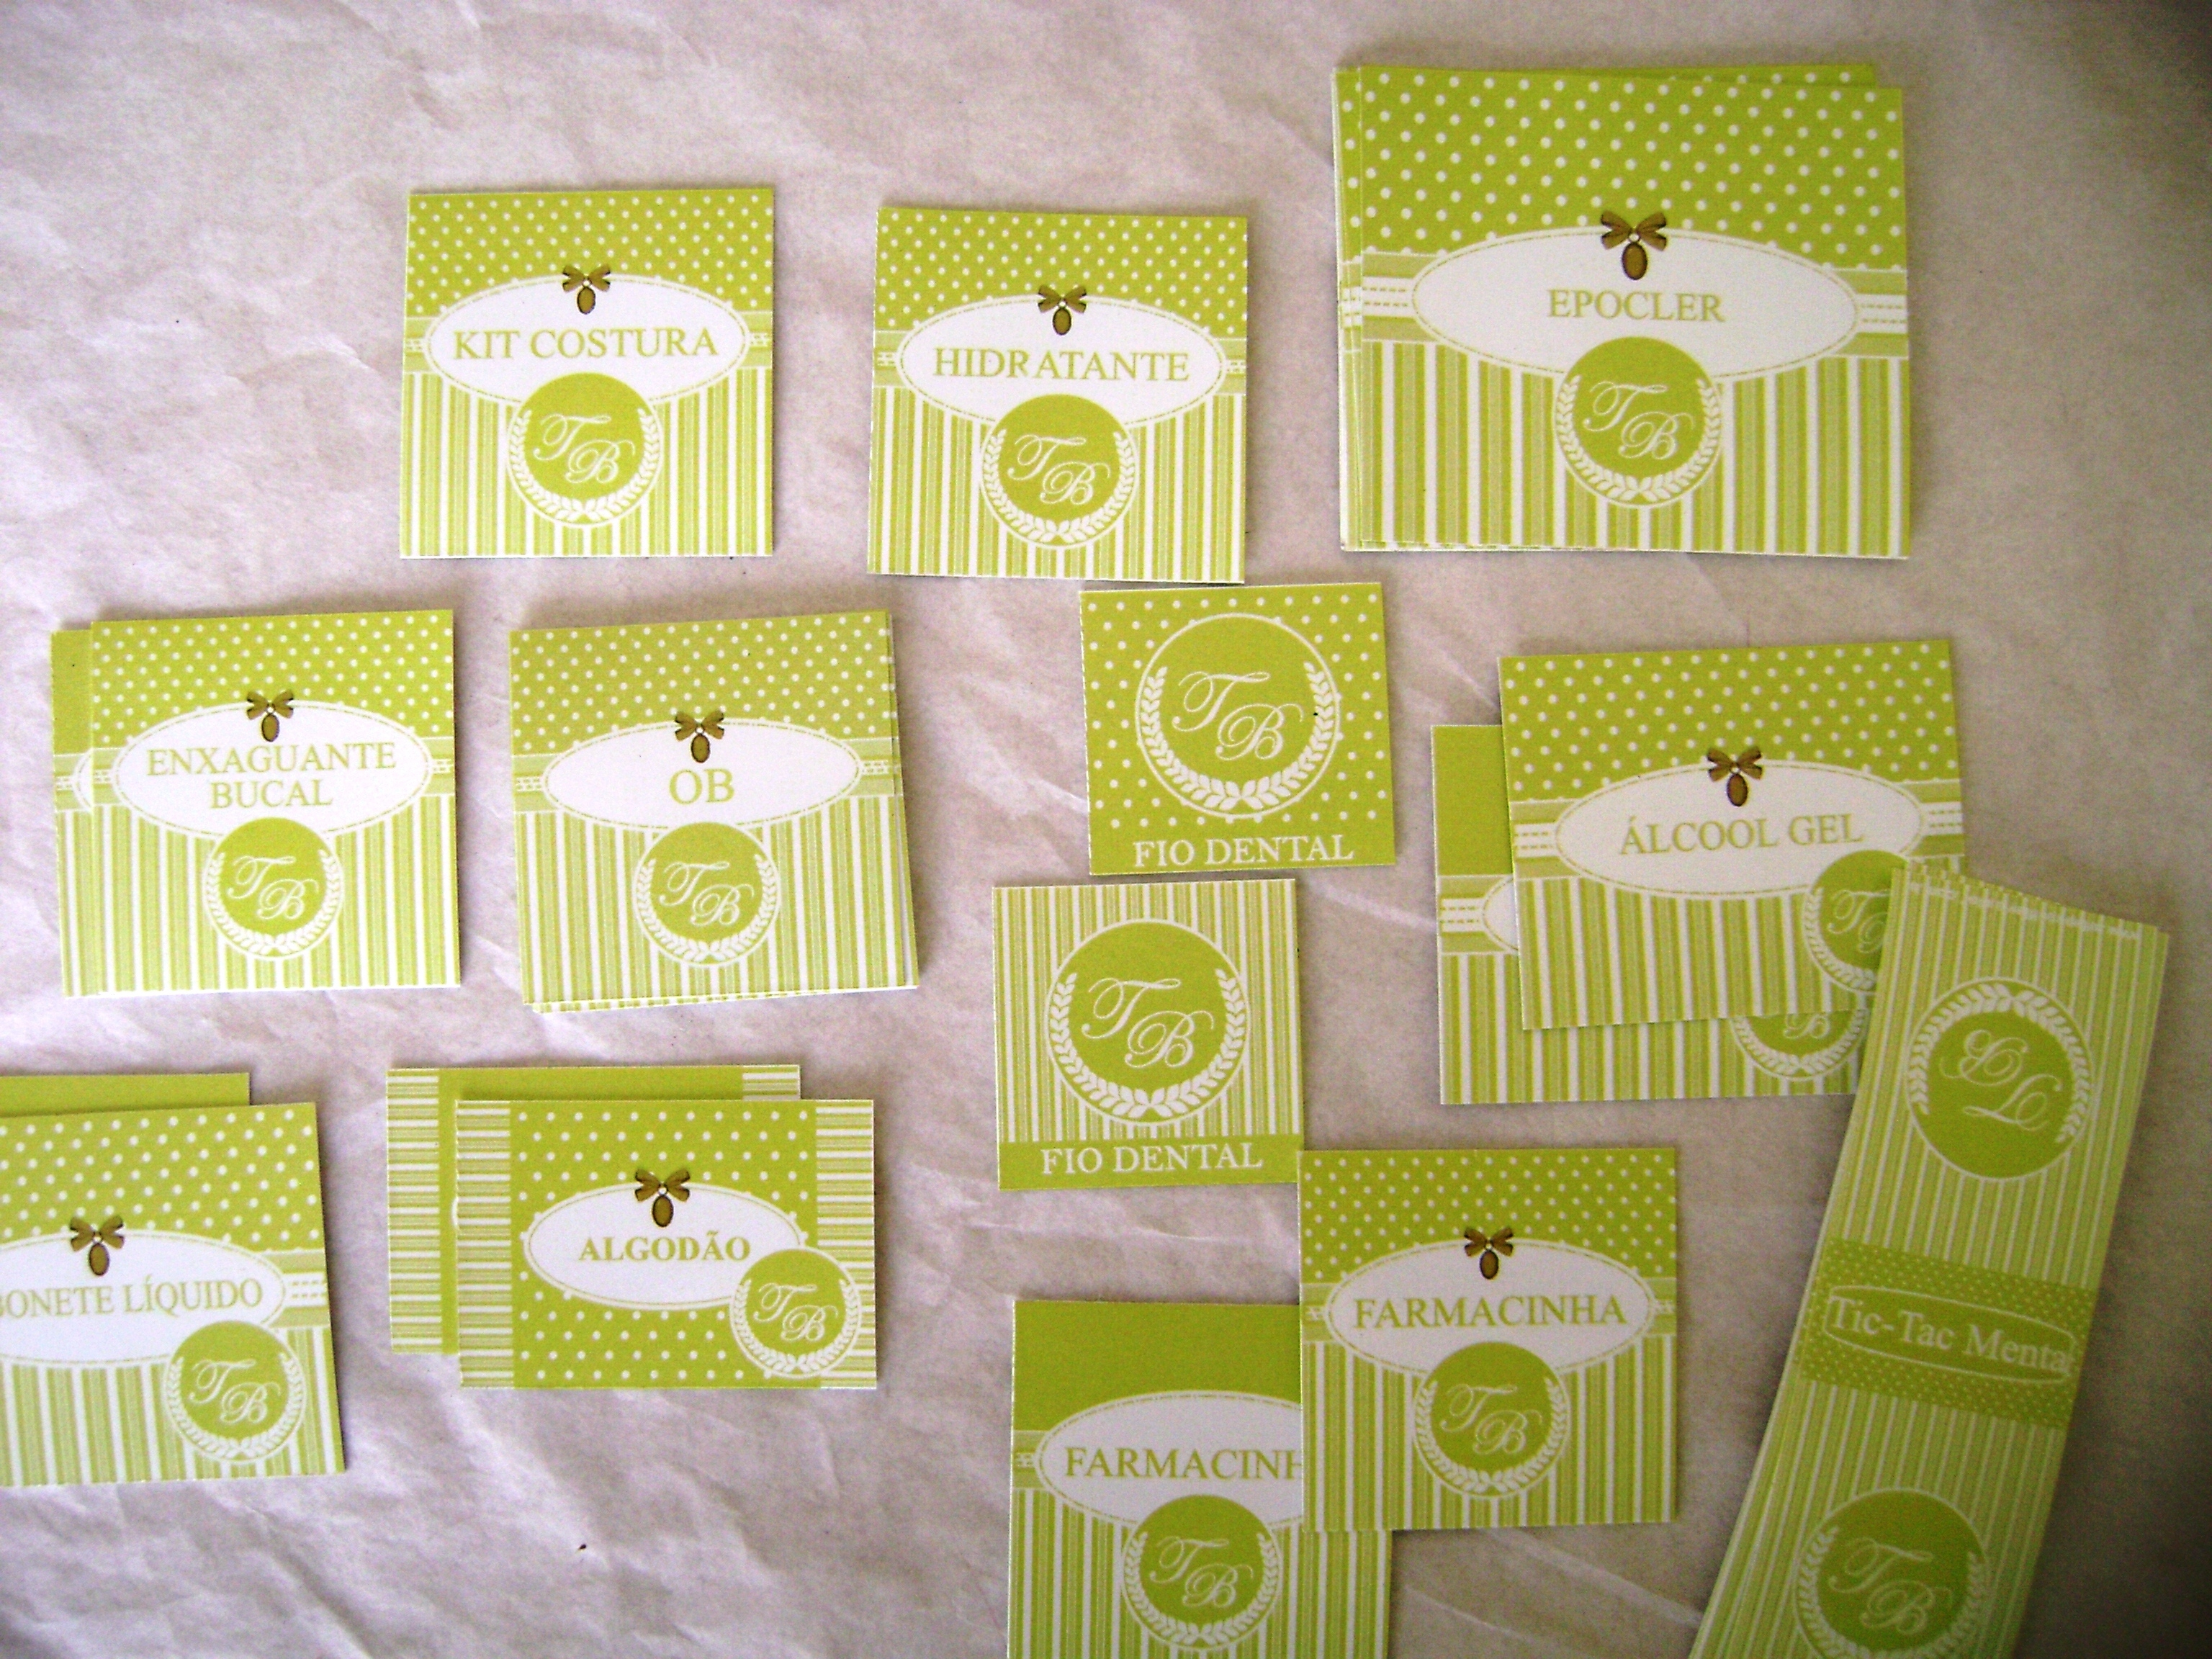 kit decoracao casamento:kit toilette casamento provencal verde kit toilette casamento